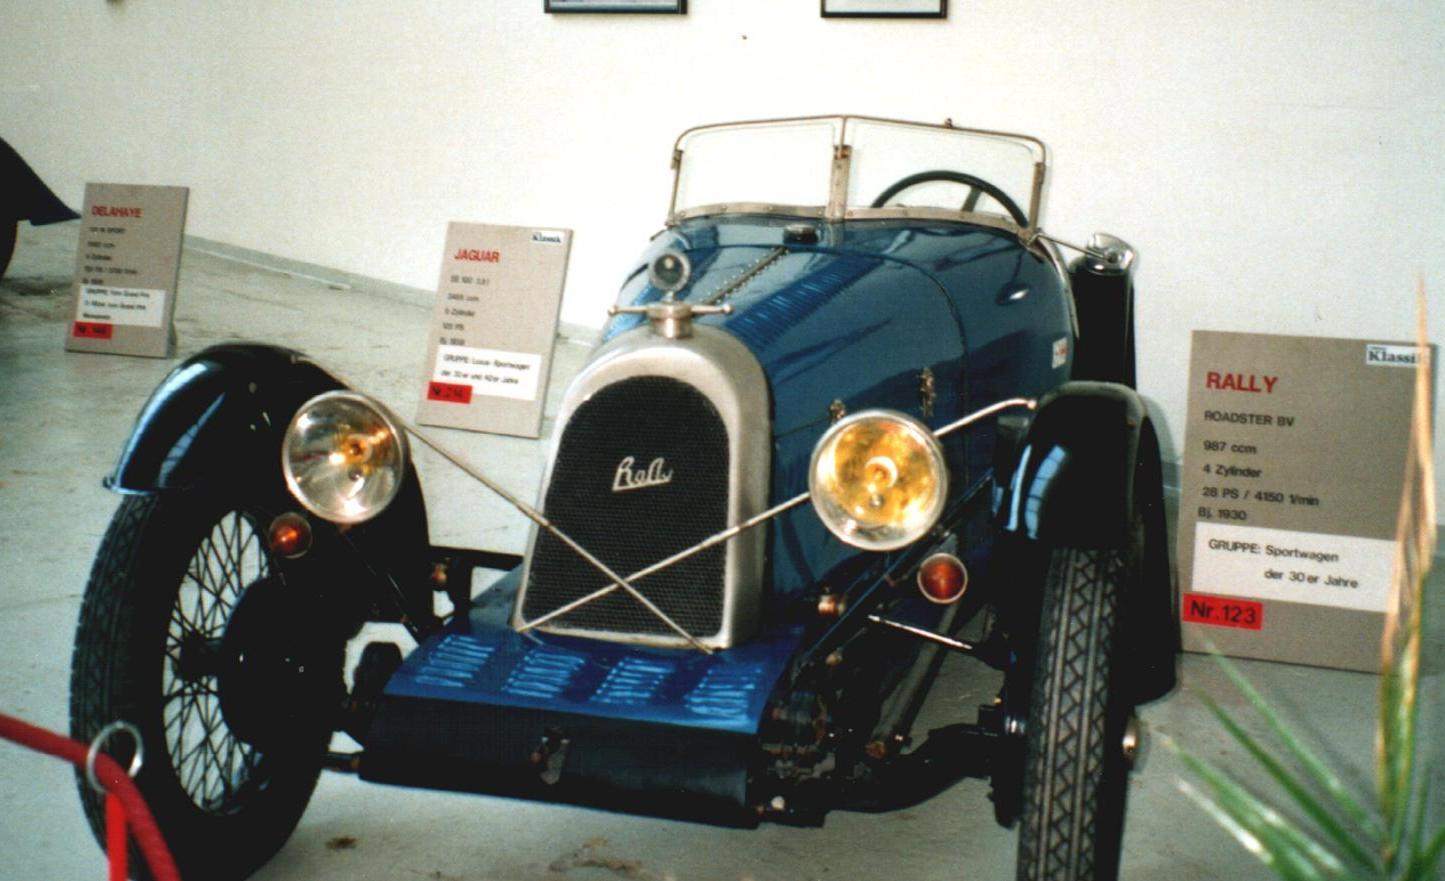 File:Rally 1930.JPG - Wikipedia